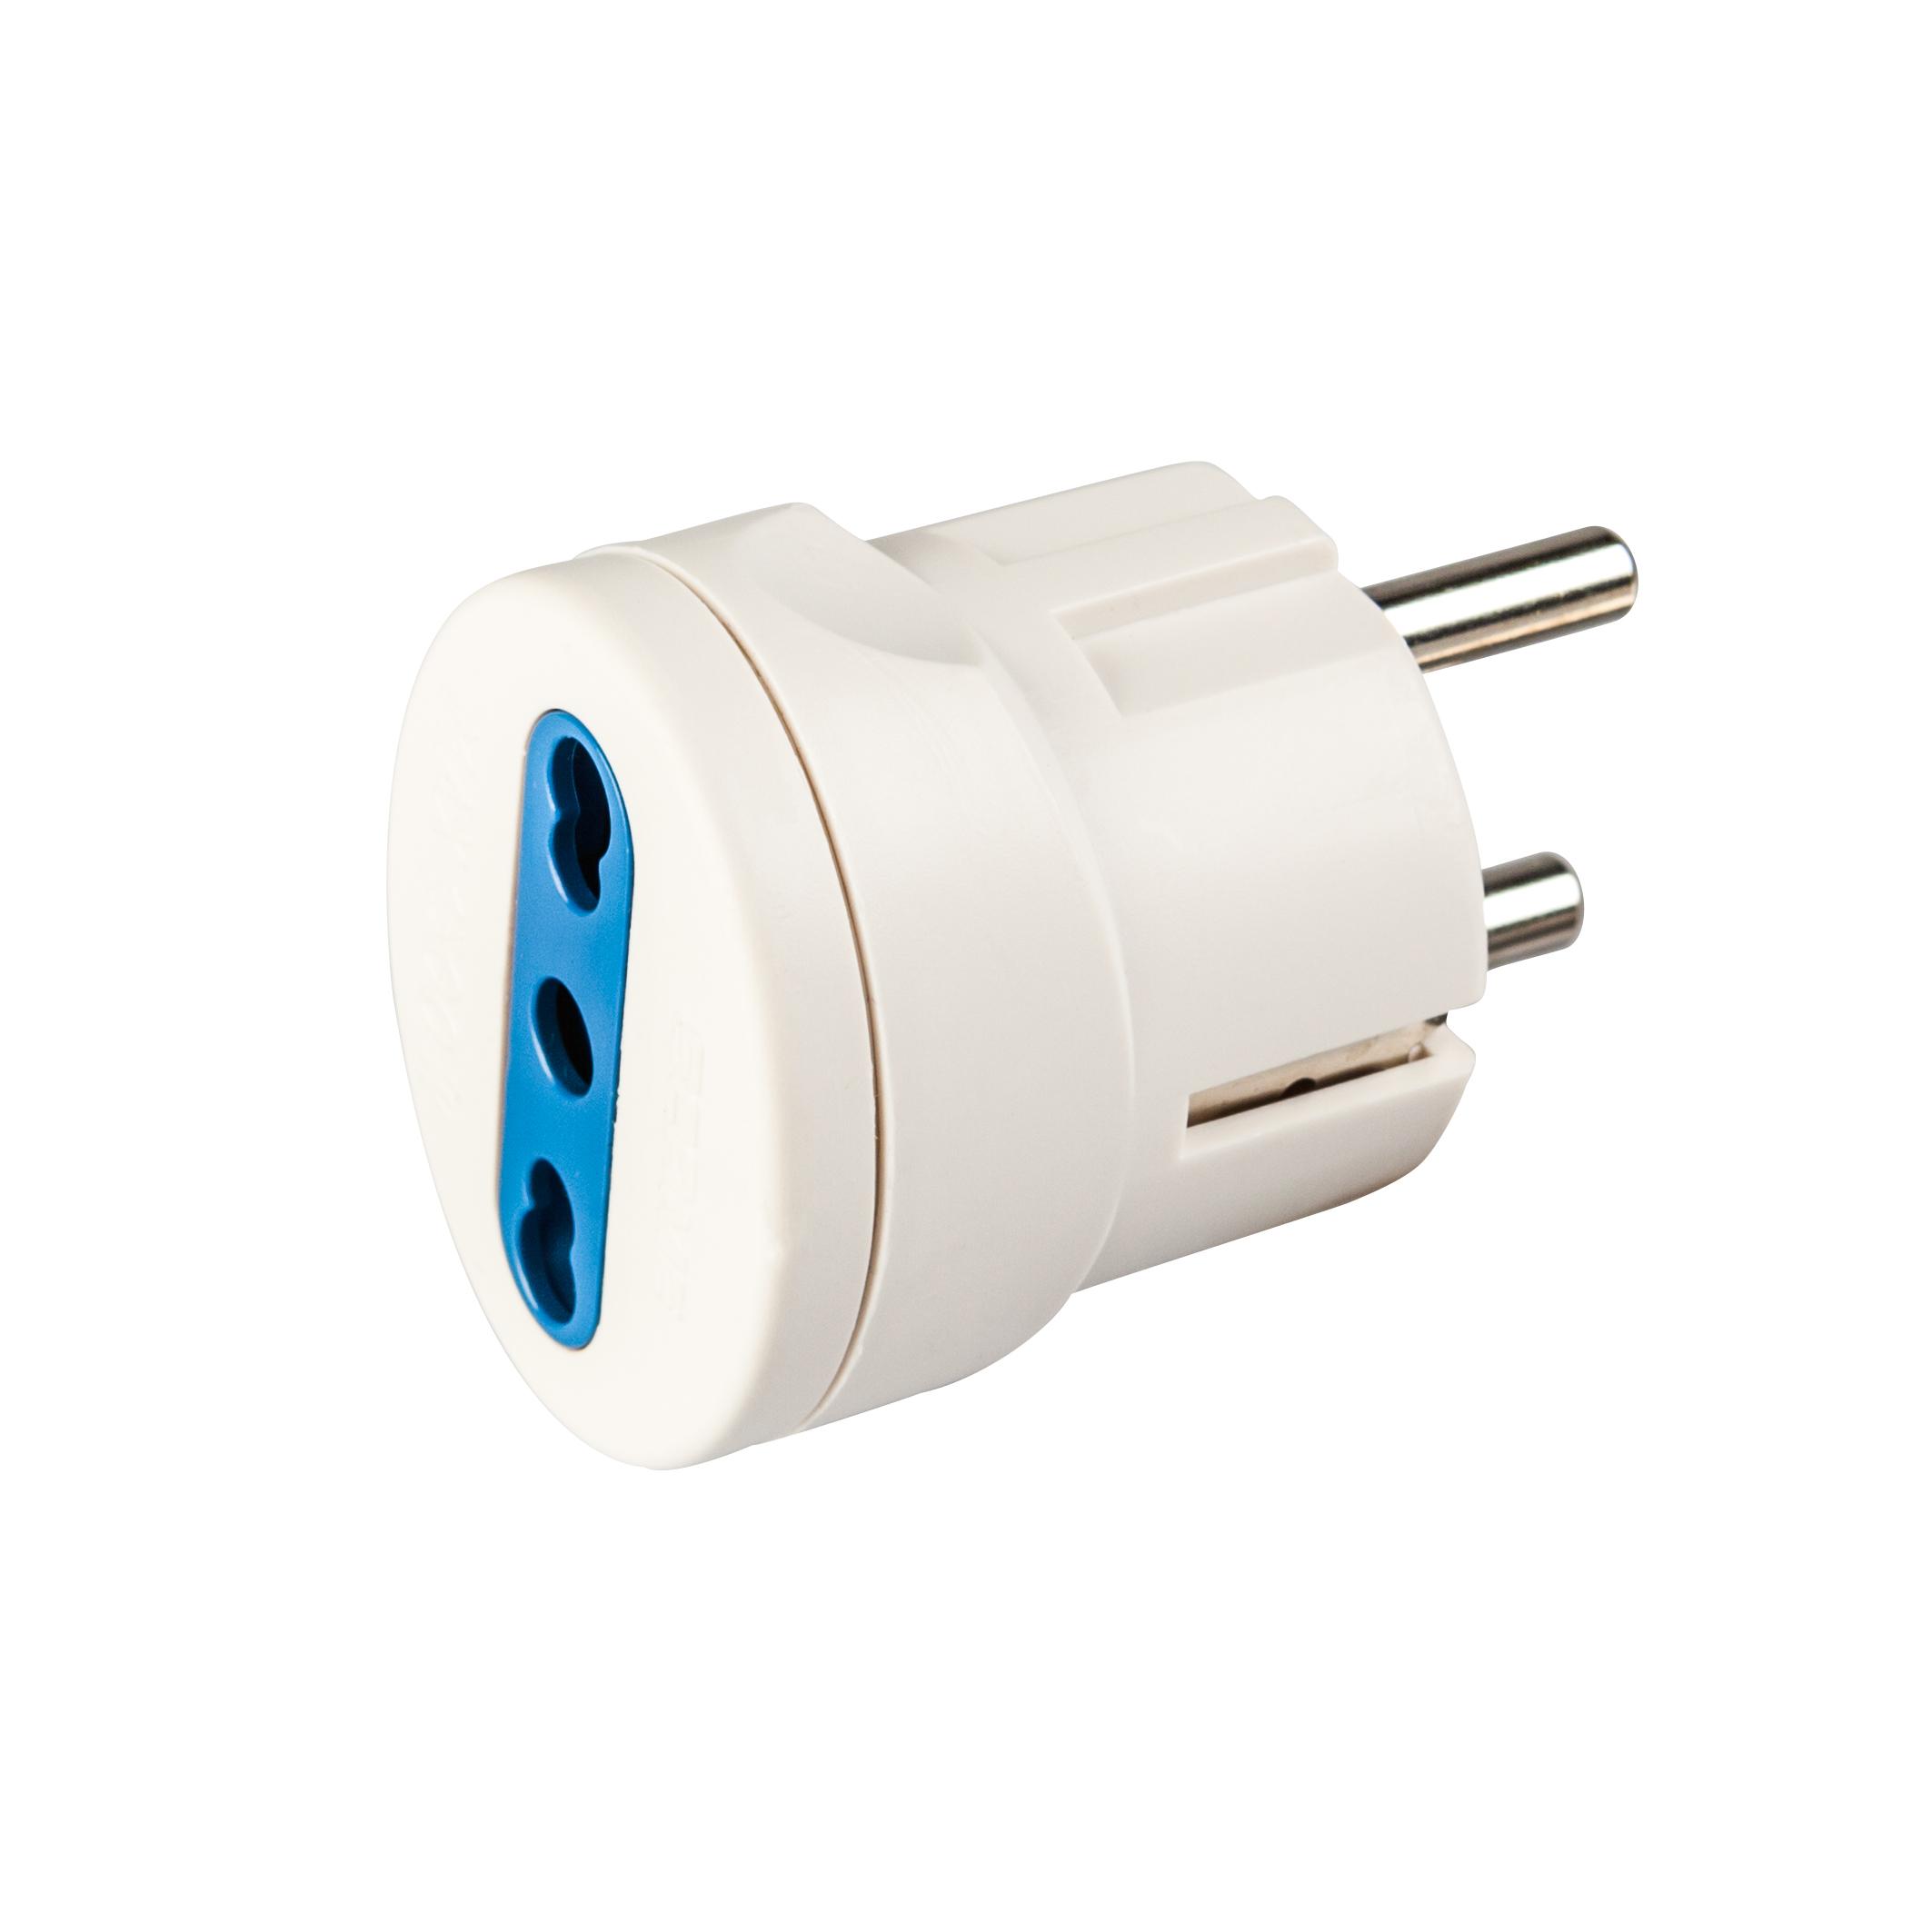 Poly Pool PP0451 adattatore per presa di corrente Tipo L (IT) Universale Blu, Bianco